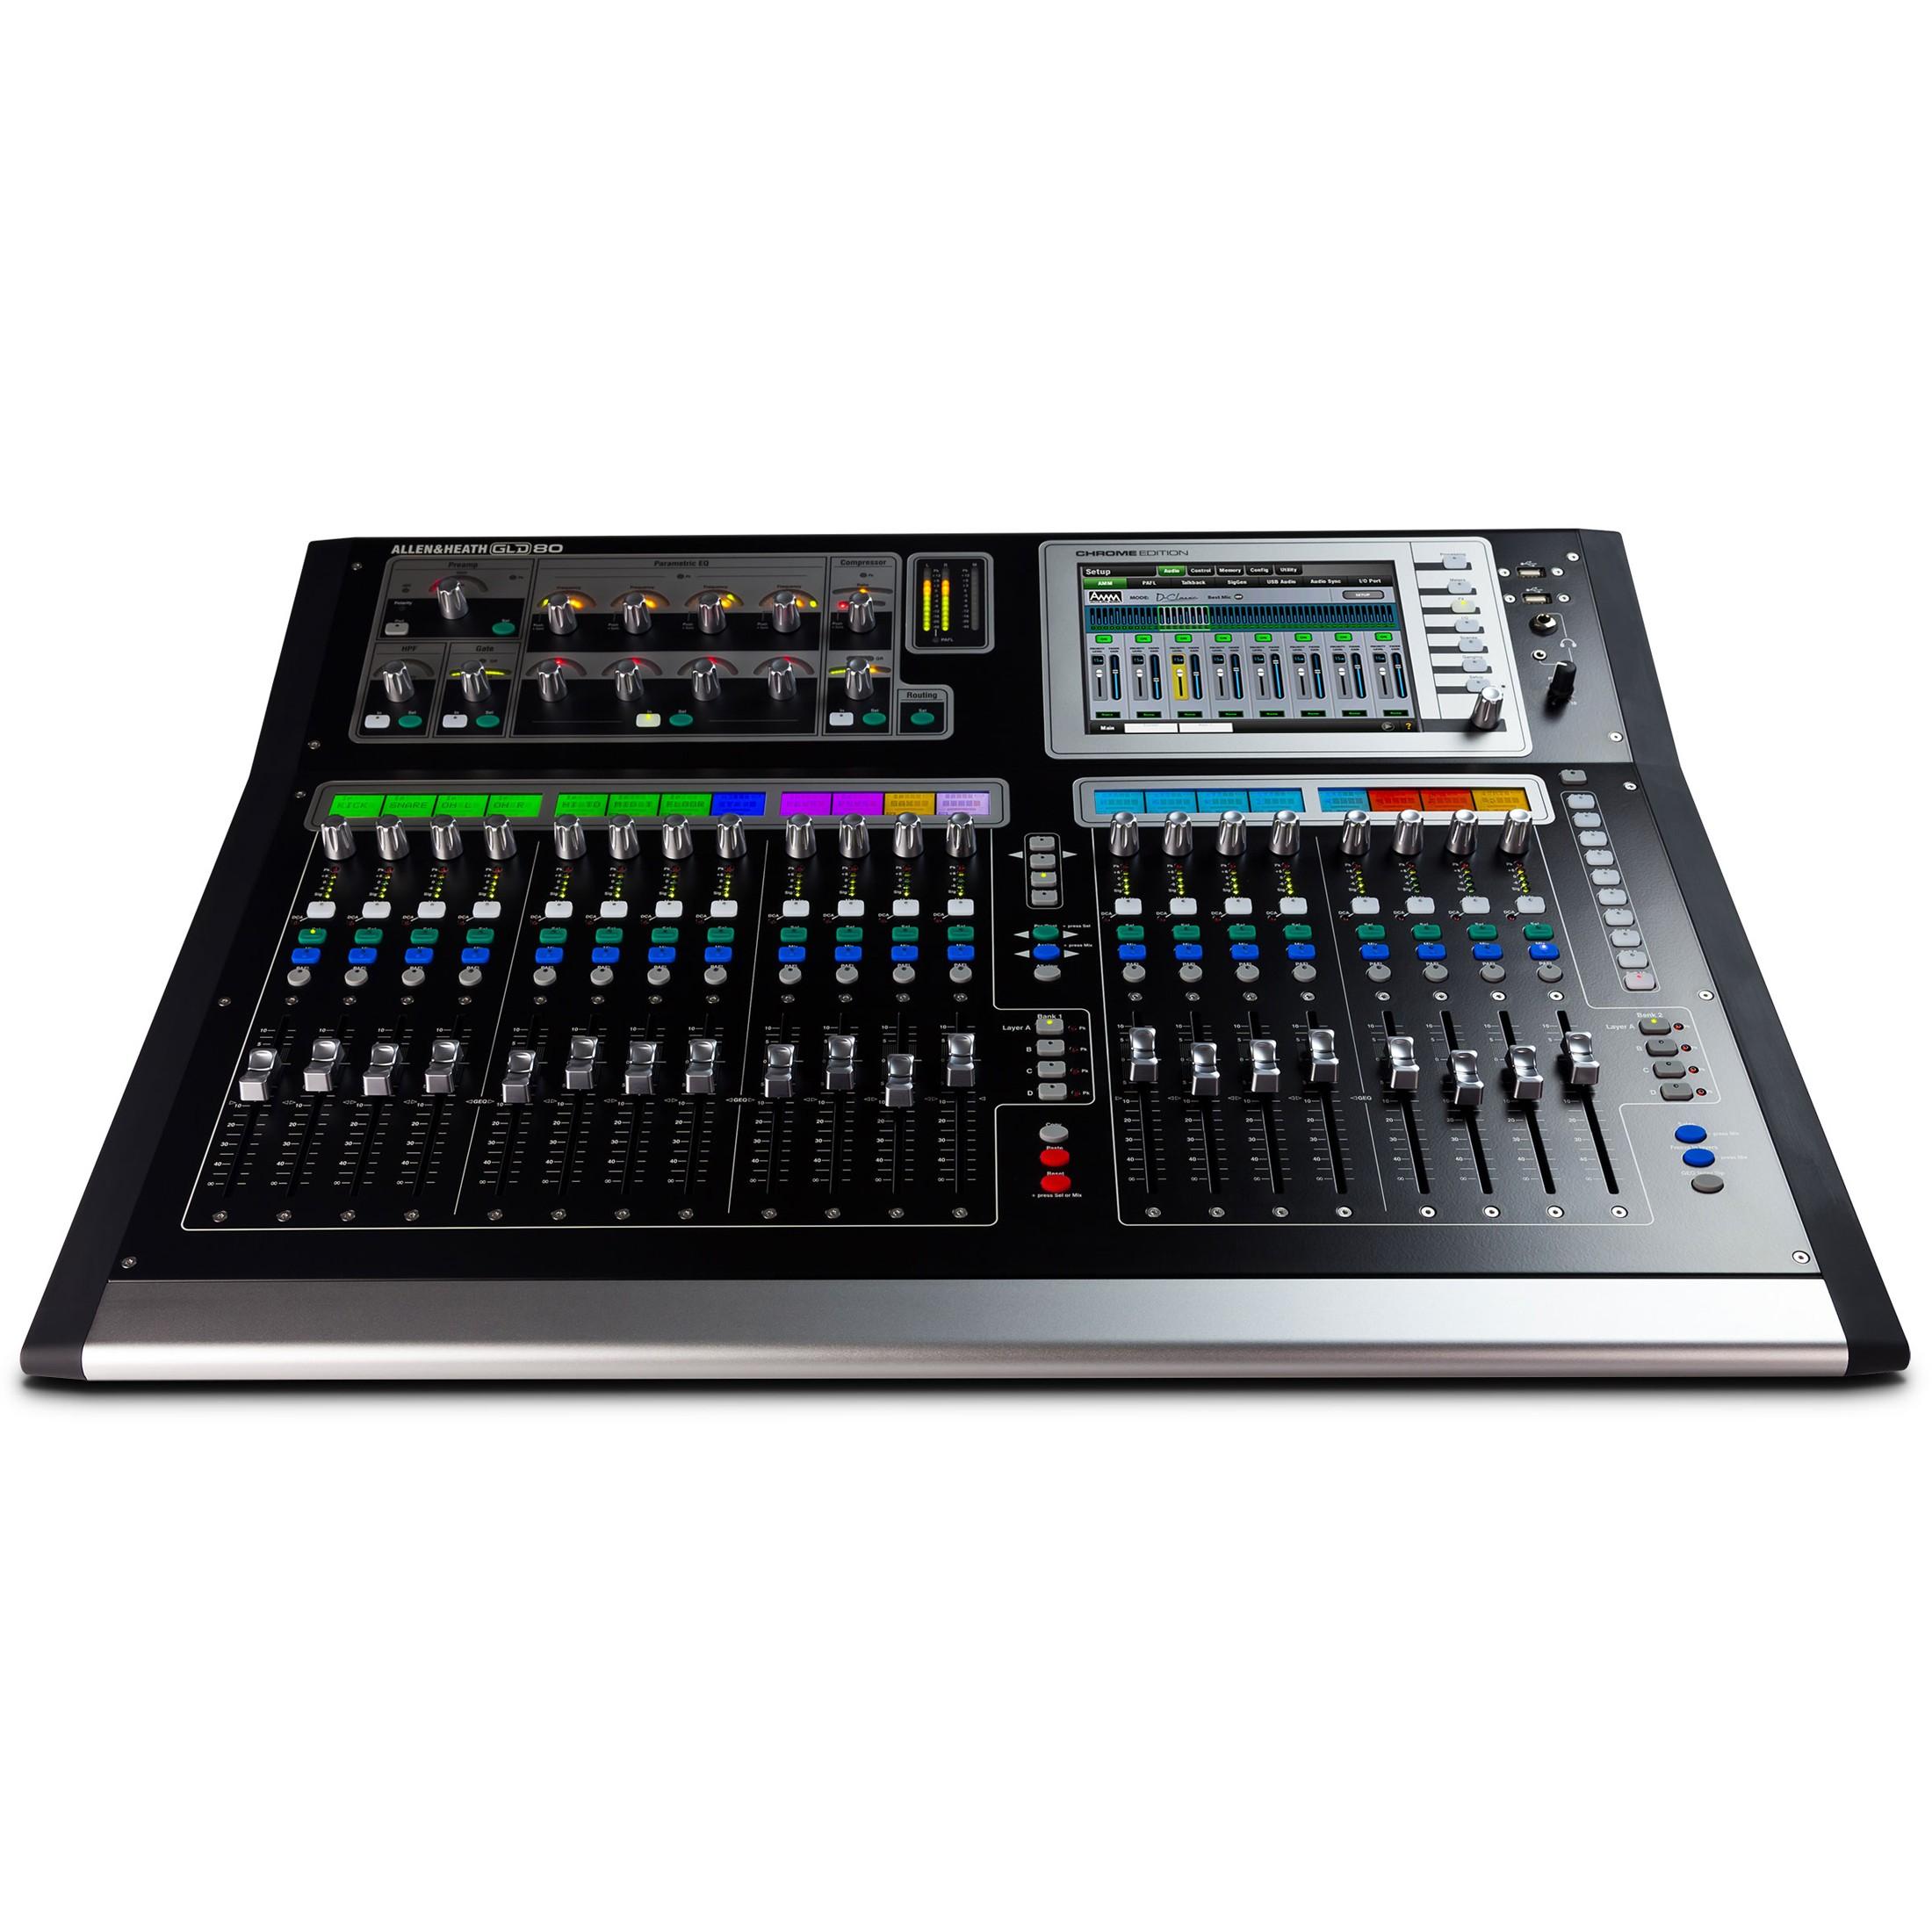 Gld Quote: Allen & Heath GLD-80 Chrome Edition Compact Digital Mixer